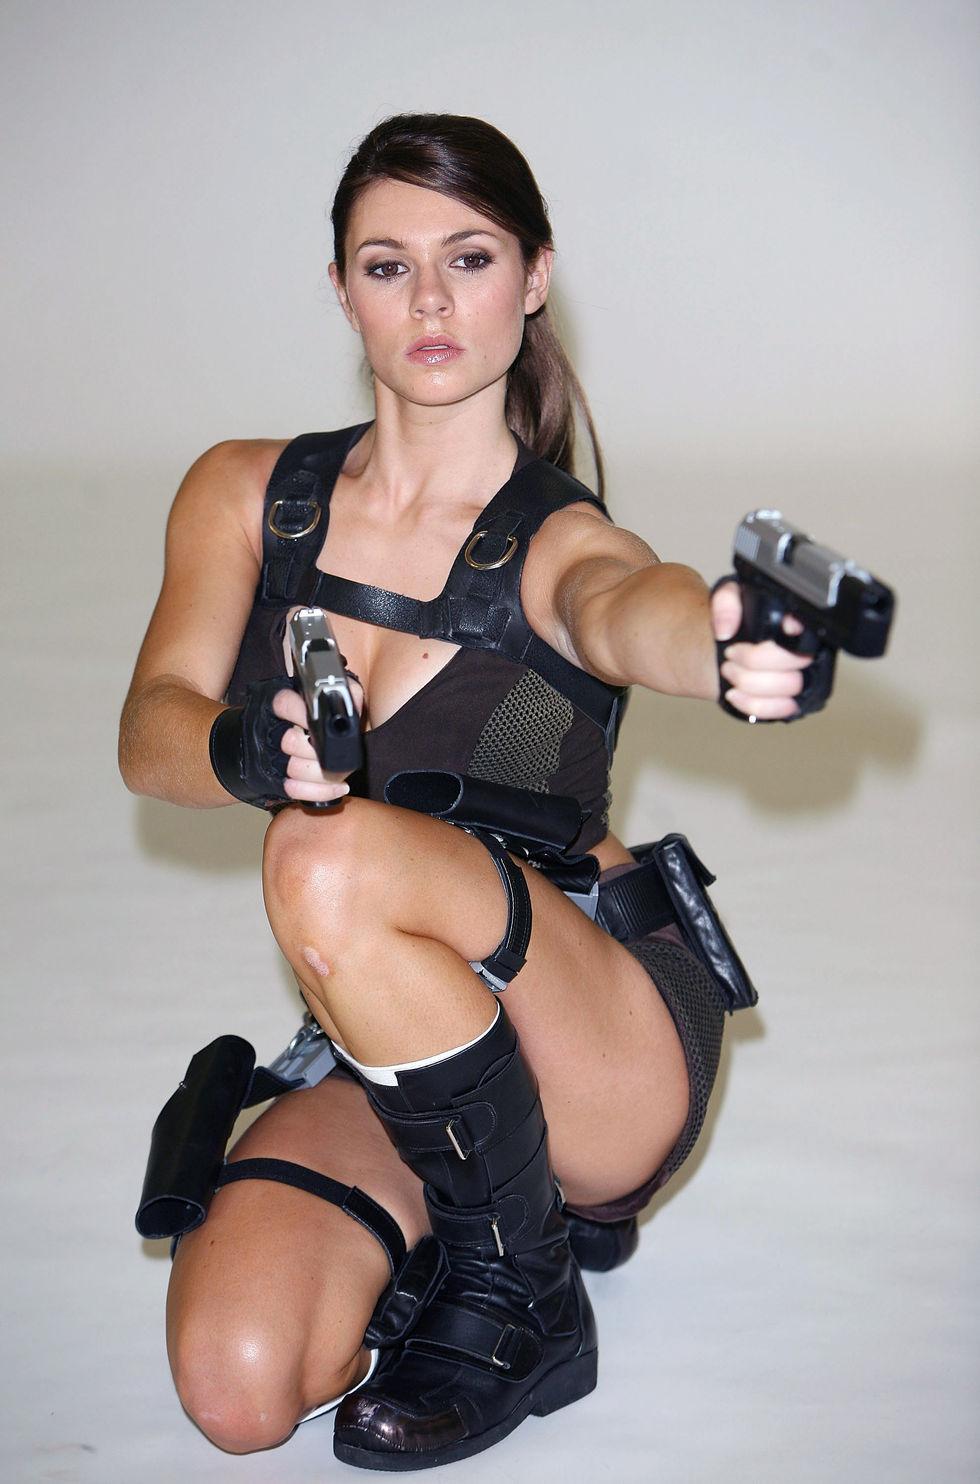 Lara croft nu fake nackt clips